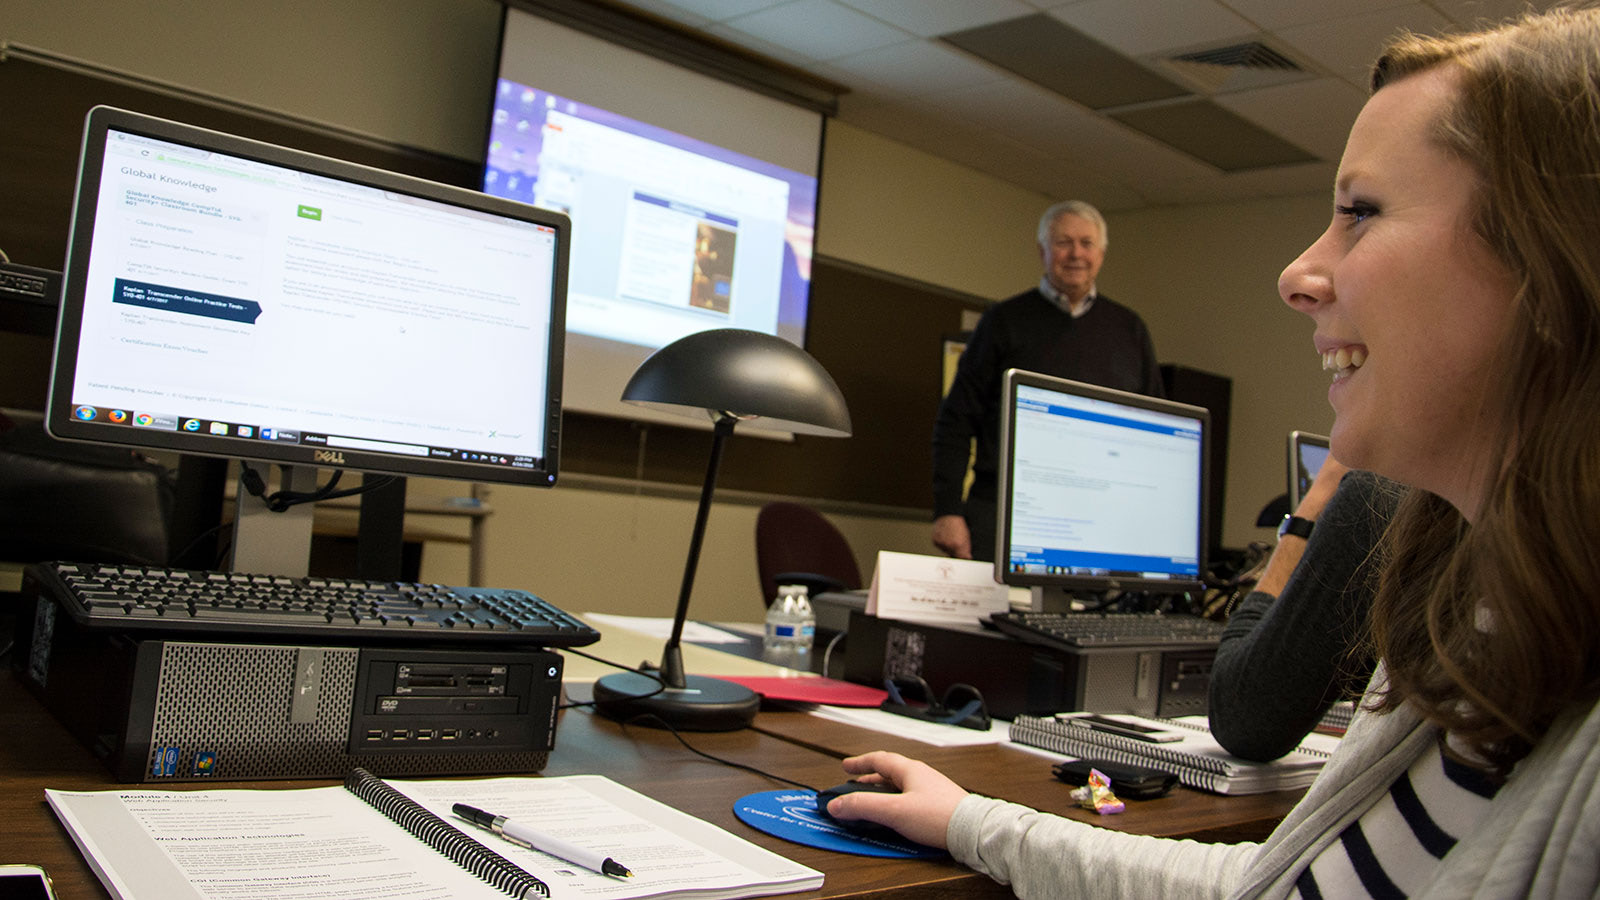 Western Maryland IT Training